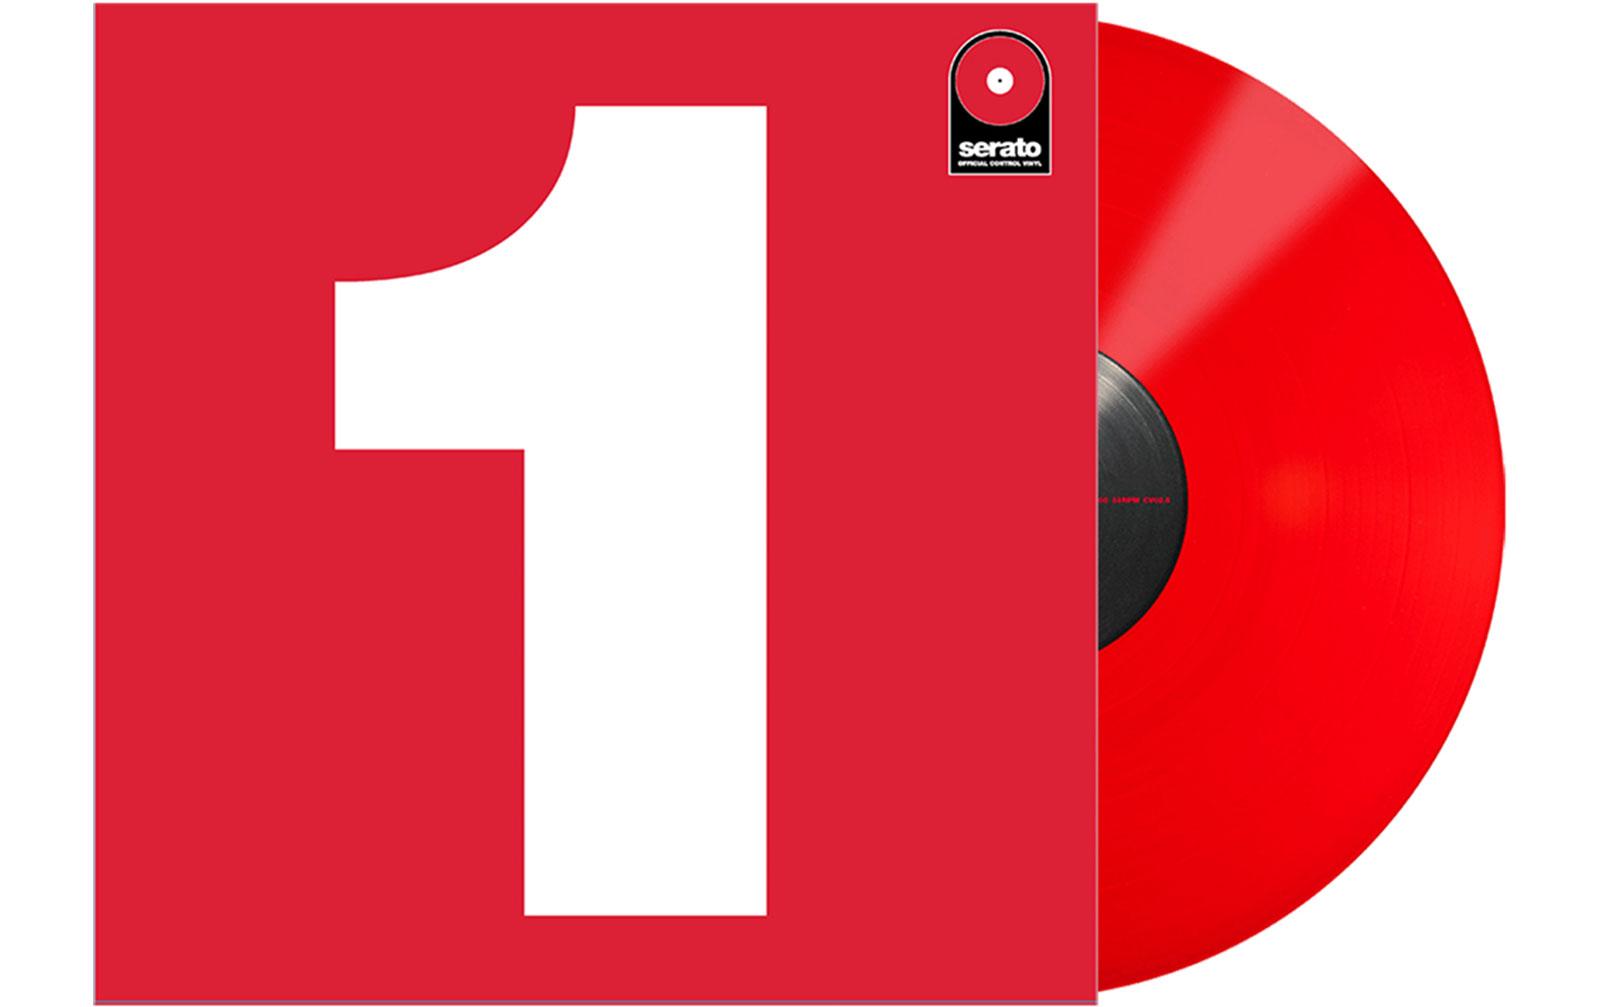 serato-12-single-control-vinyl-rot-performance-serie-cv2-5